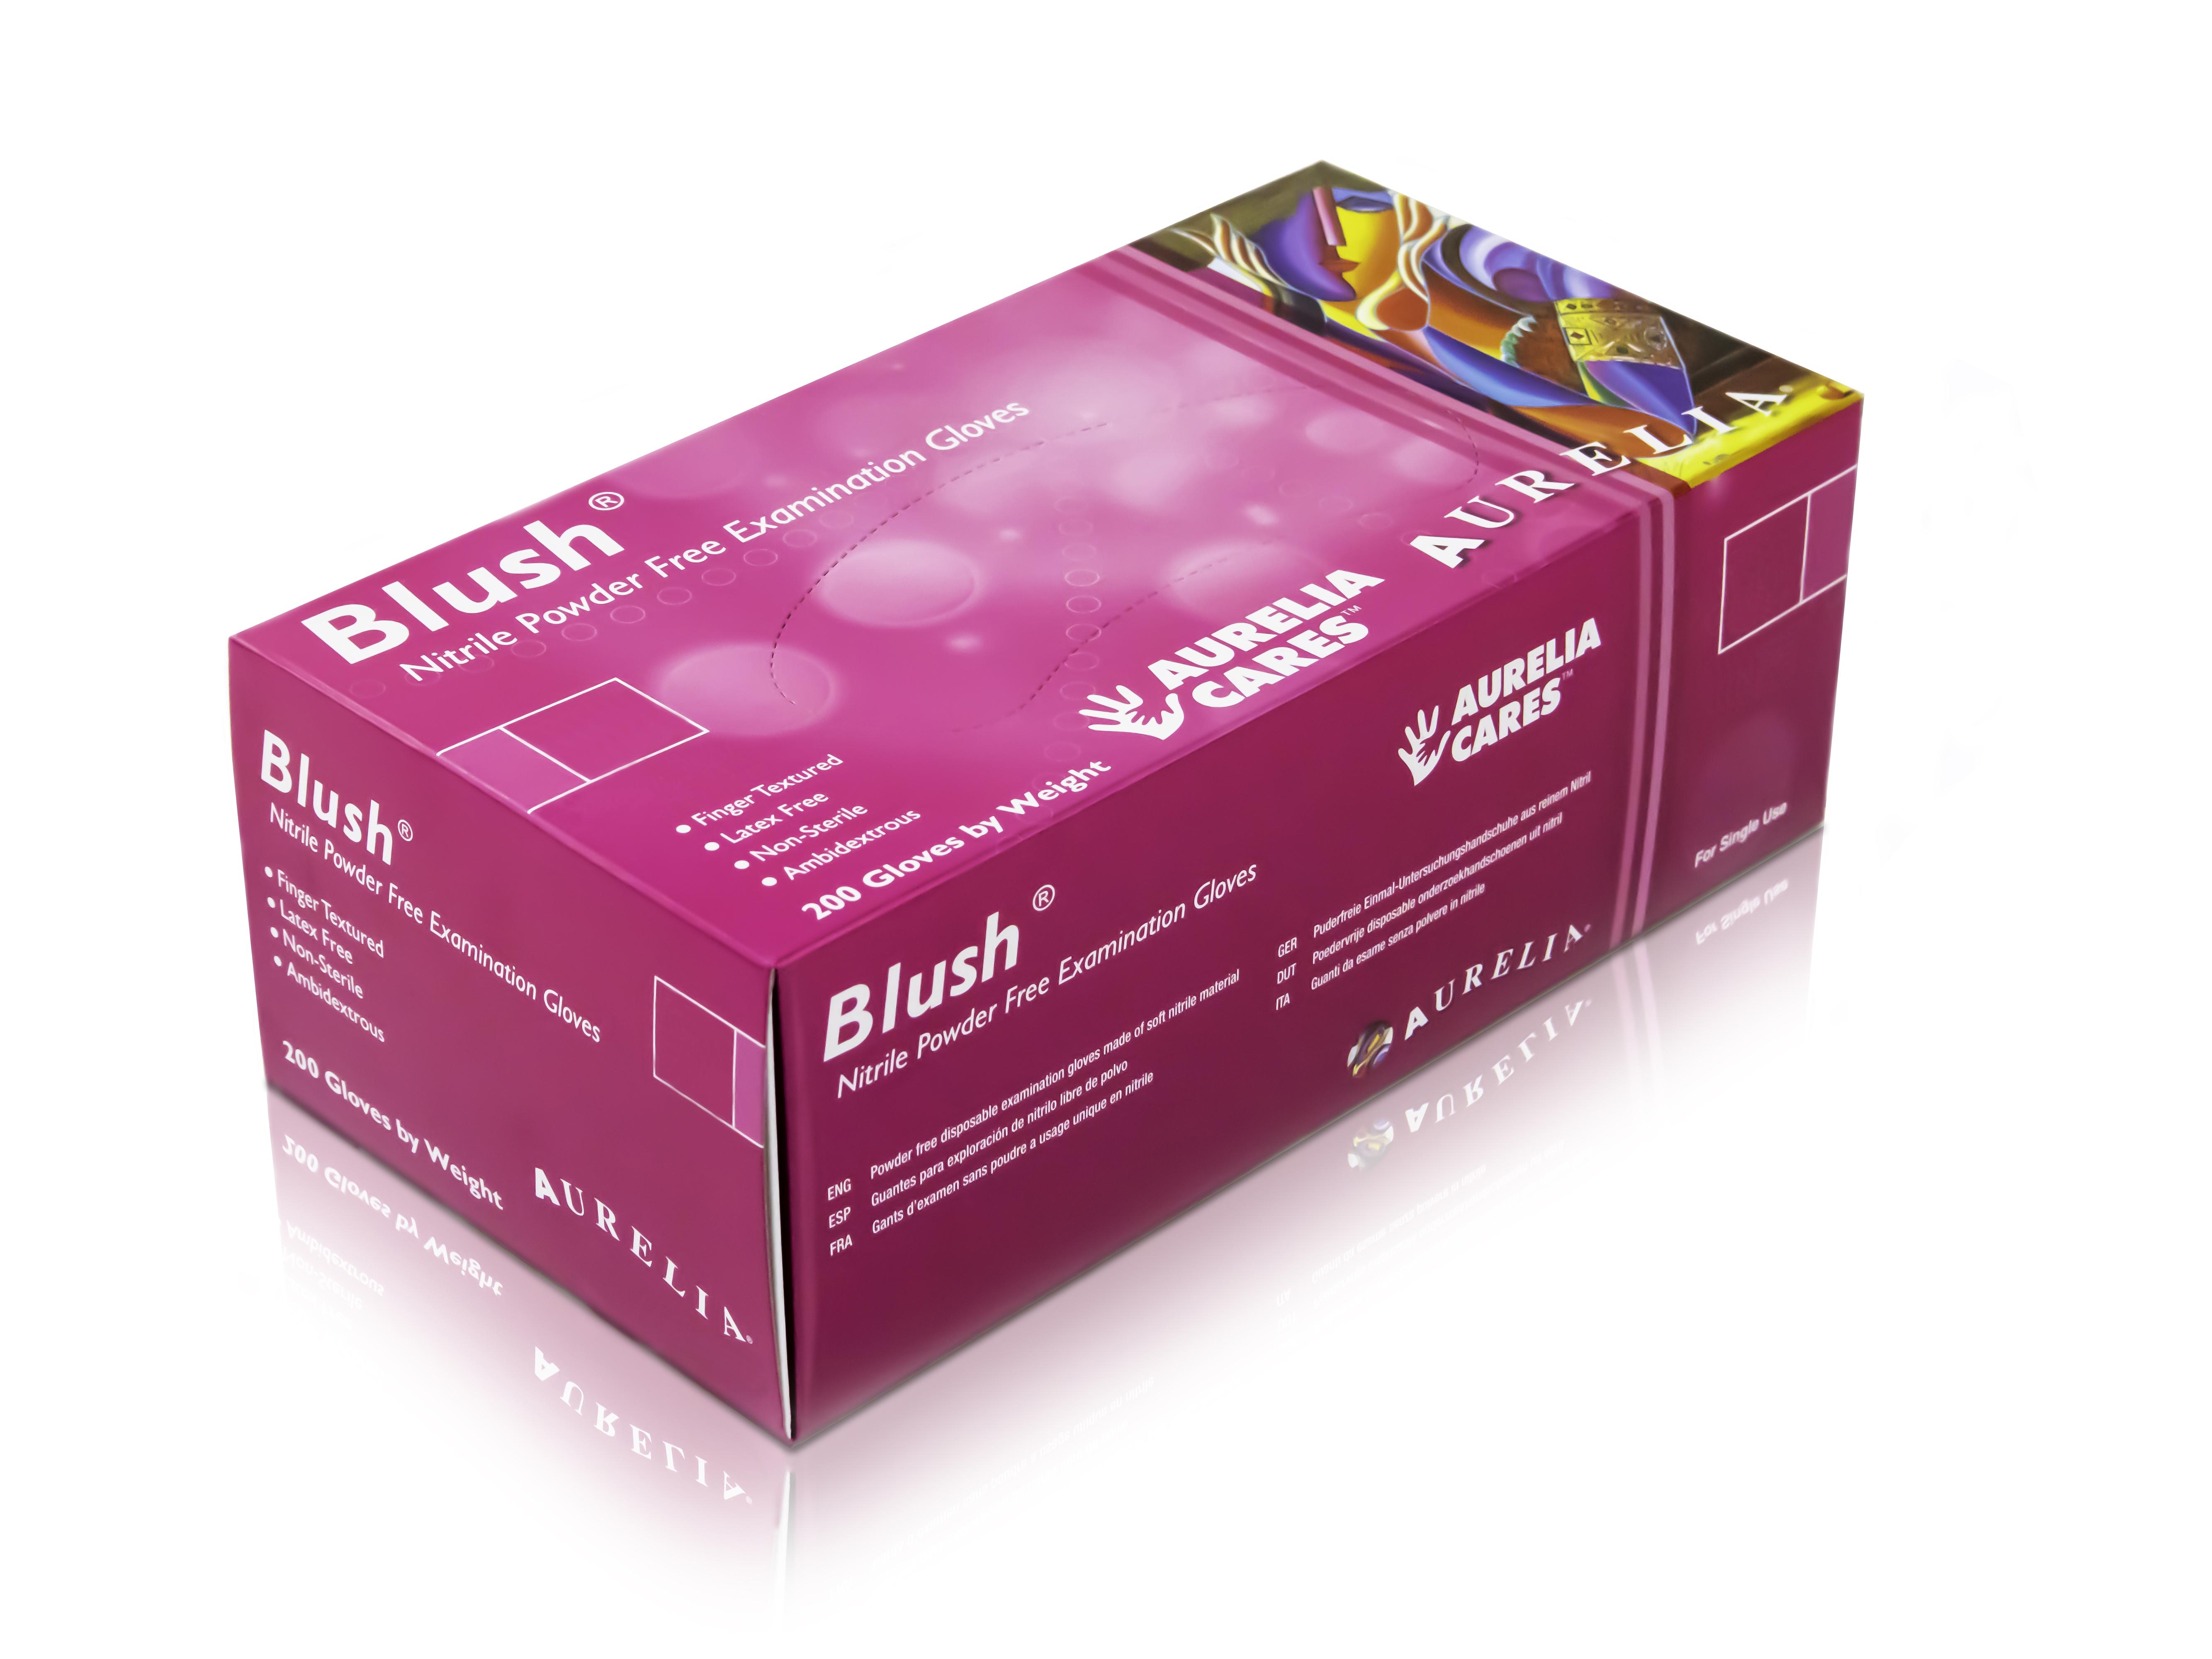 Blush®